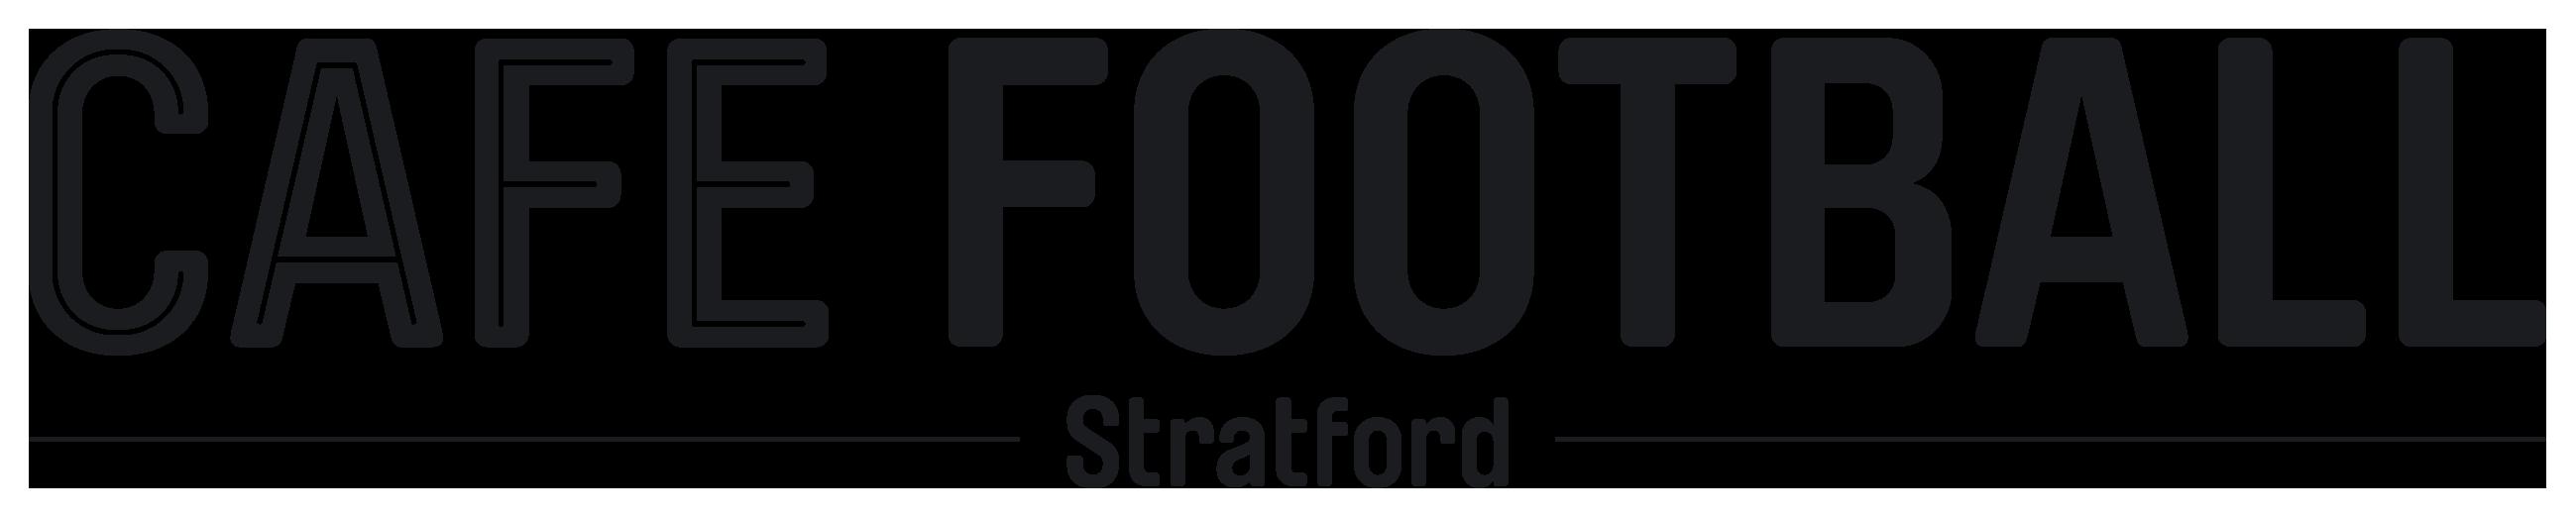 Cafe Football Straford Blk Logopng